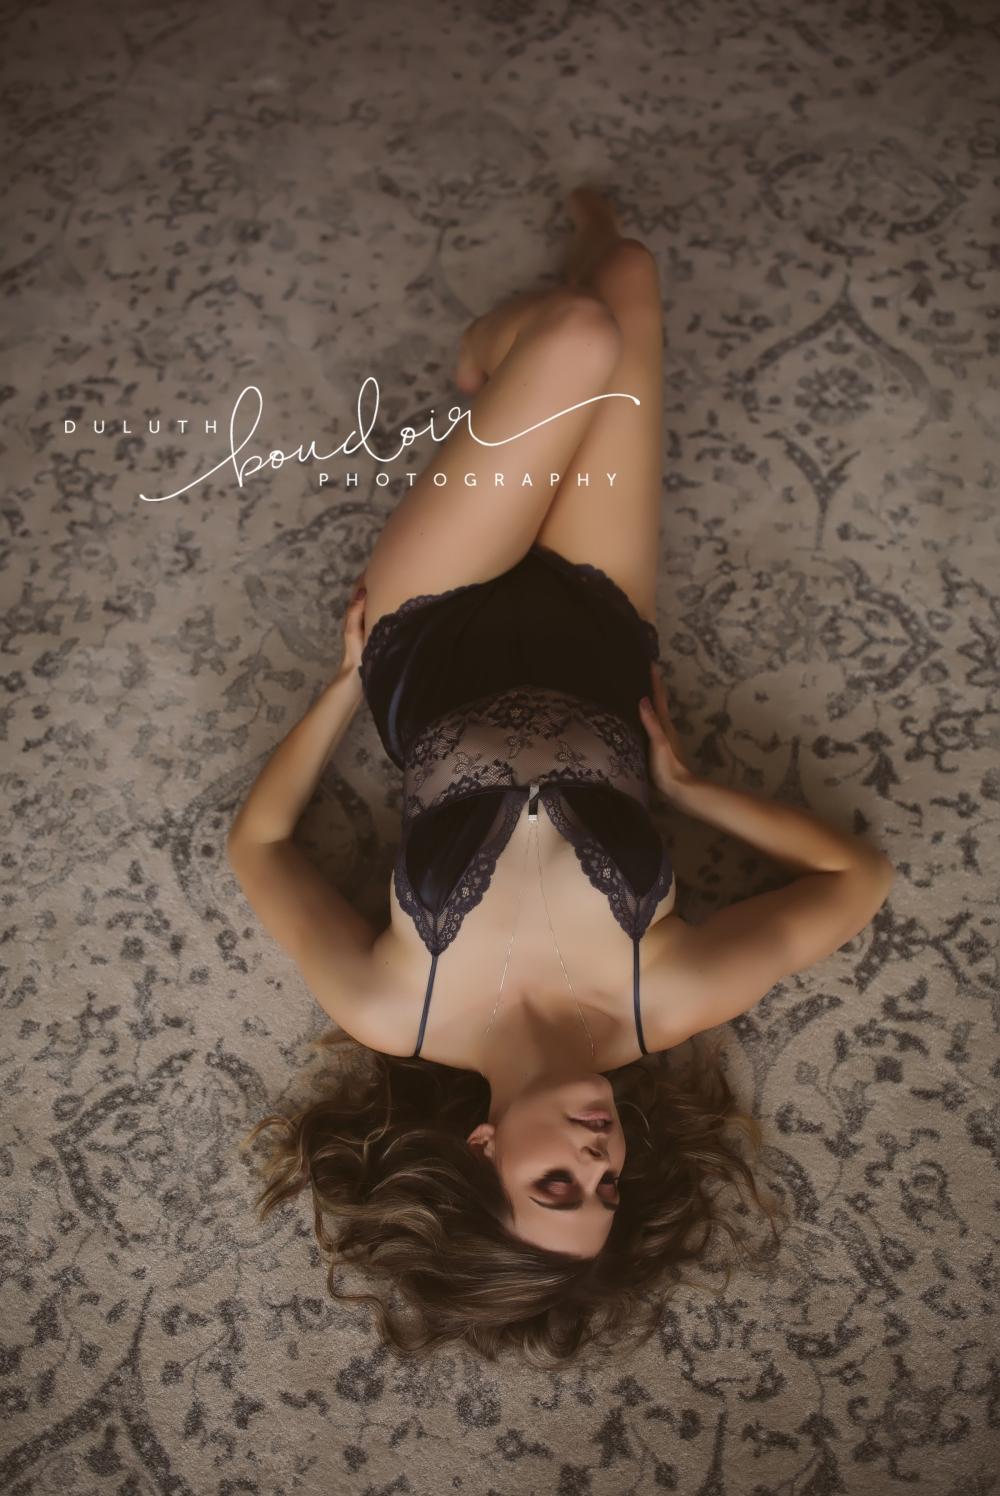 duluth_boudoir_photography_Emily_38.jpg